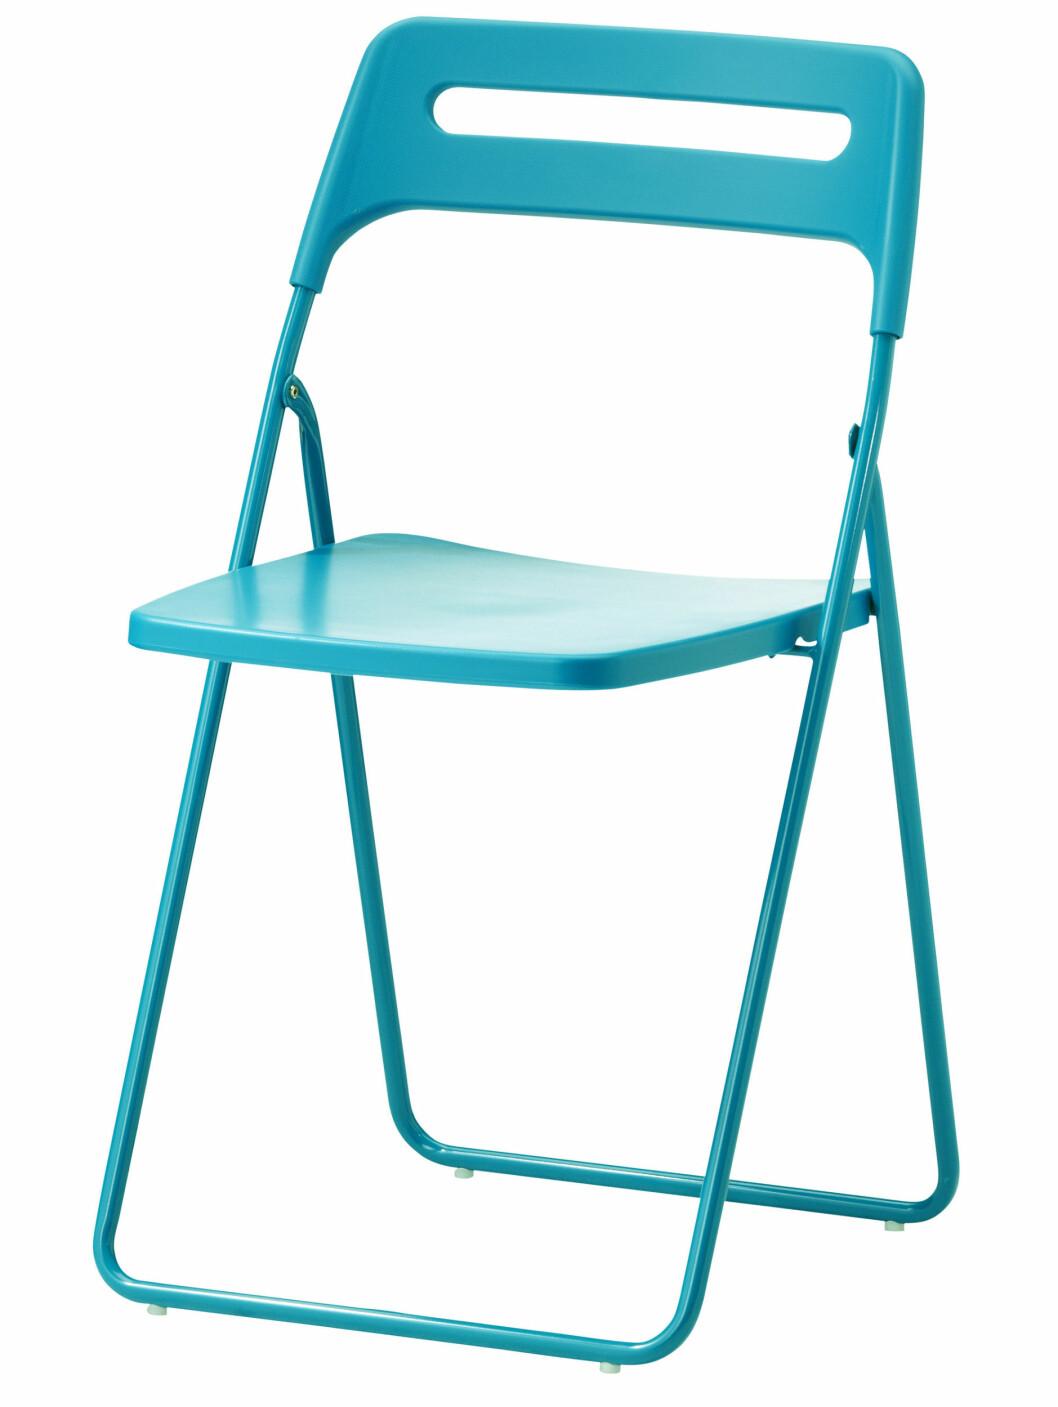 Klappstol i blått (kr 129). Foto: Produsenten